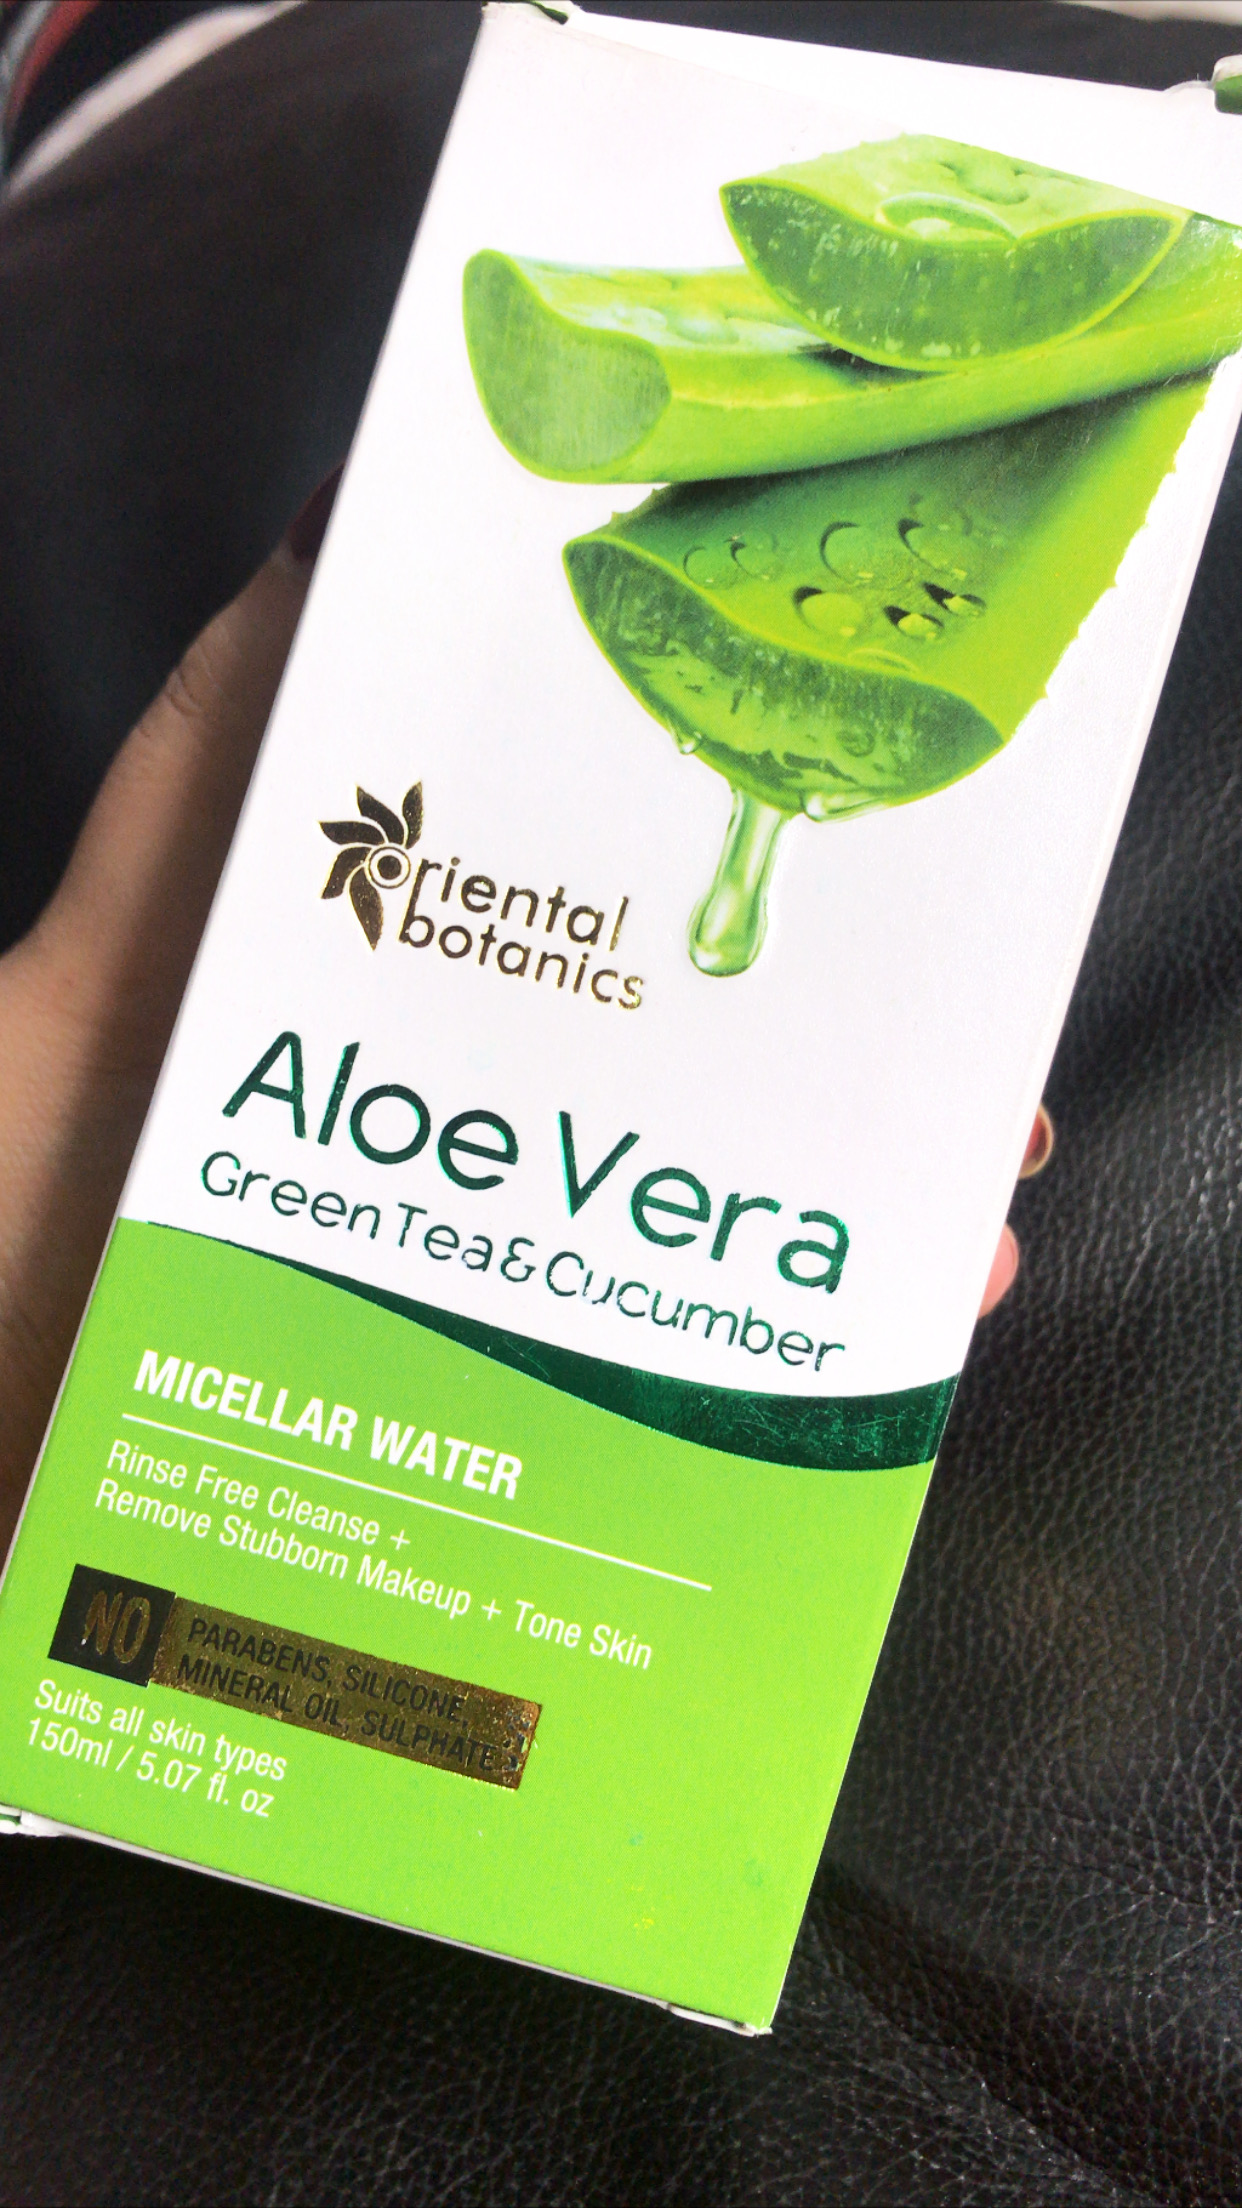 Oriental Botanics Aloe Vera, Green Tea & Cucumber Face Toner pic 1-Highly Recommended-By himanshiahuja